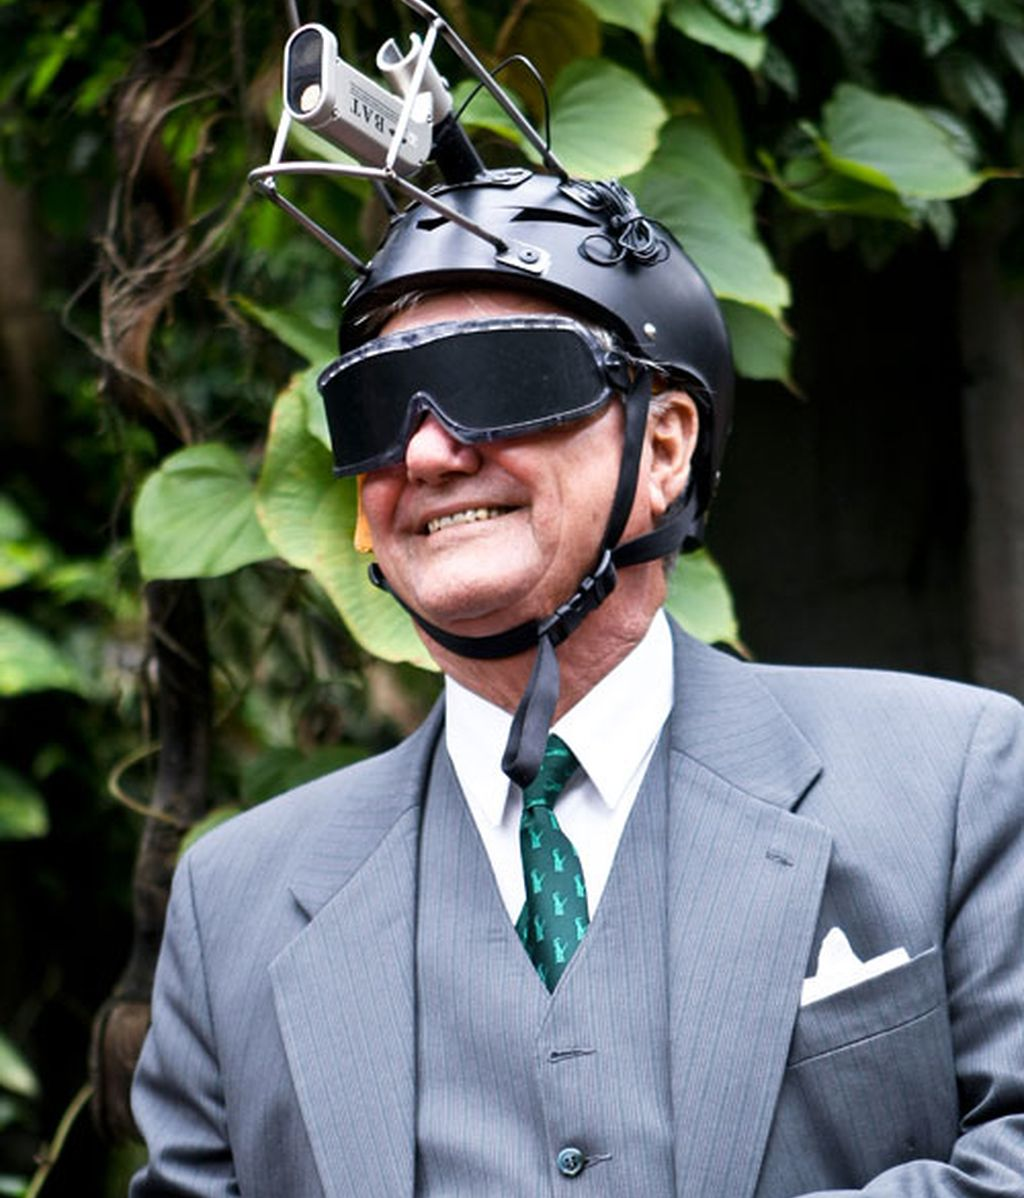 Celebrities rendidas al casco